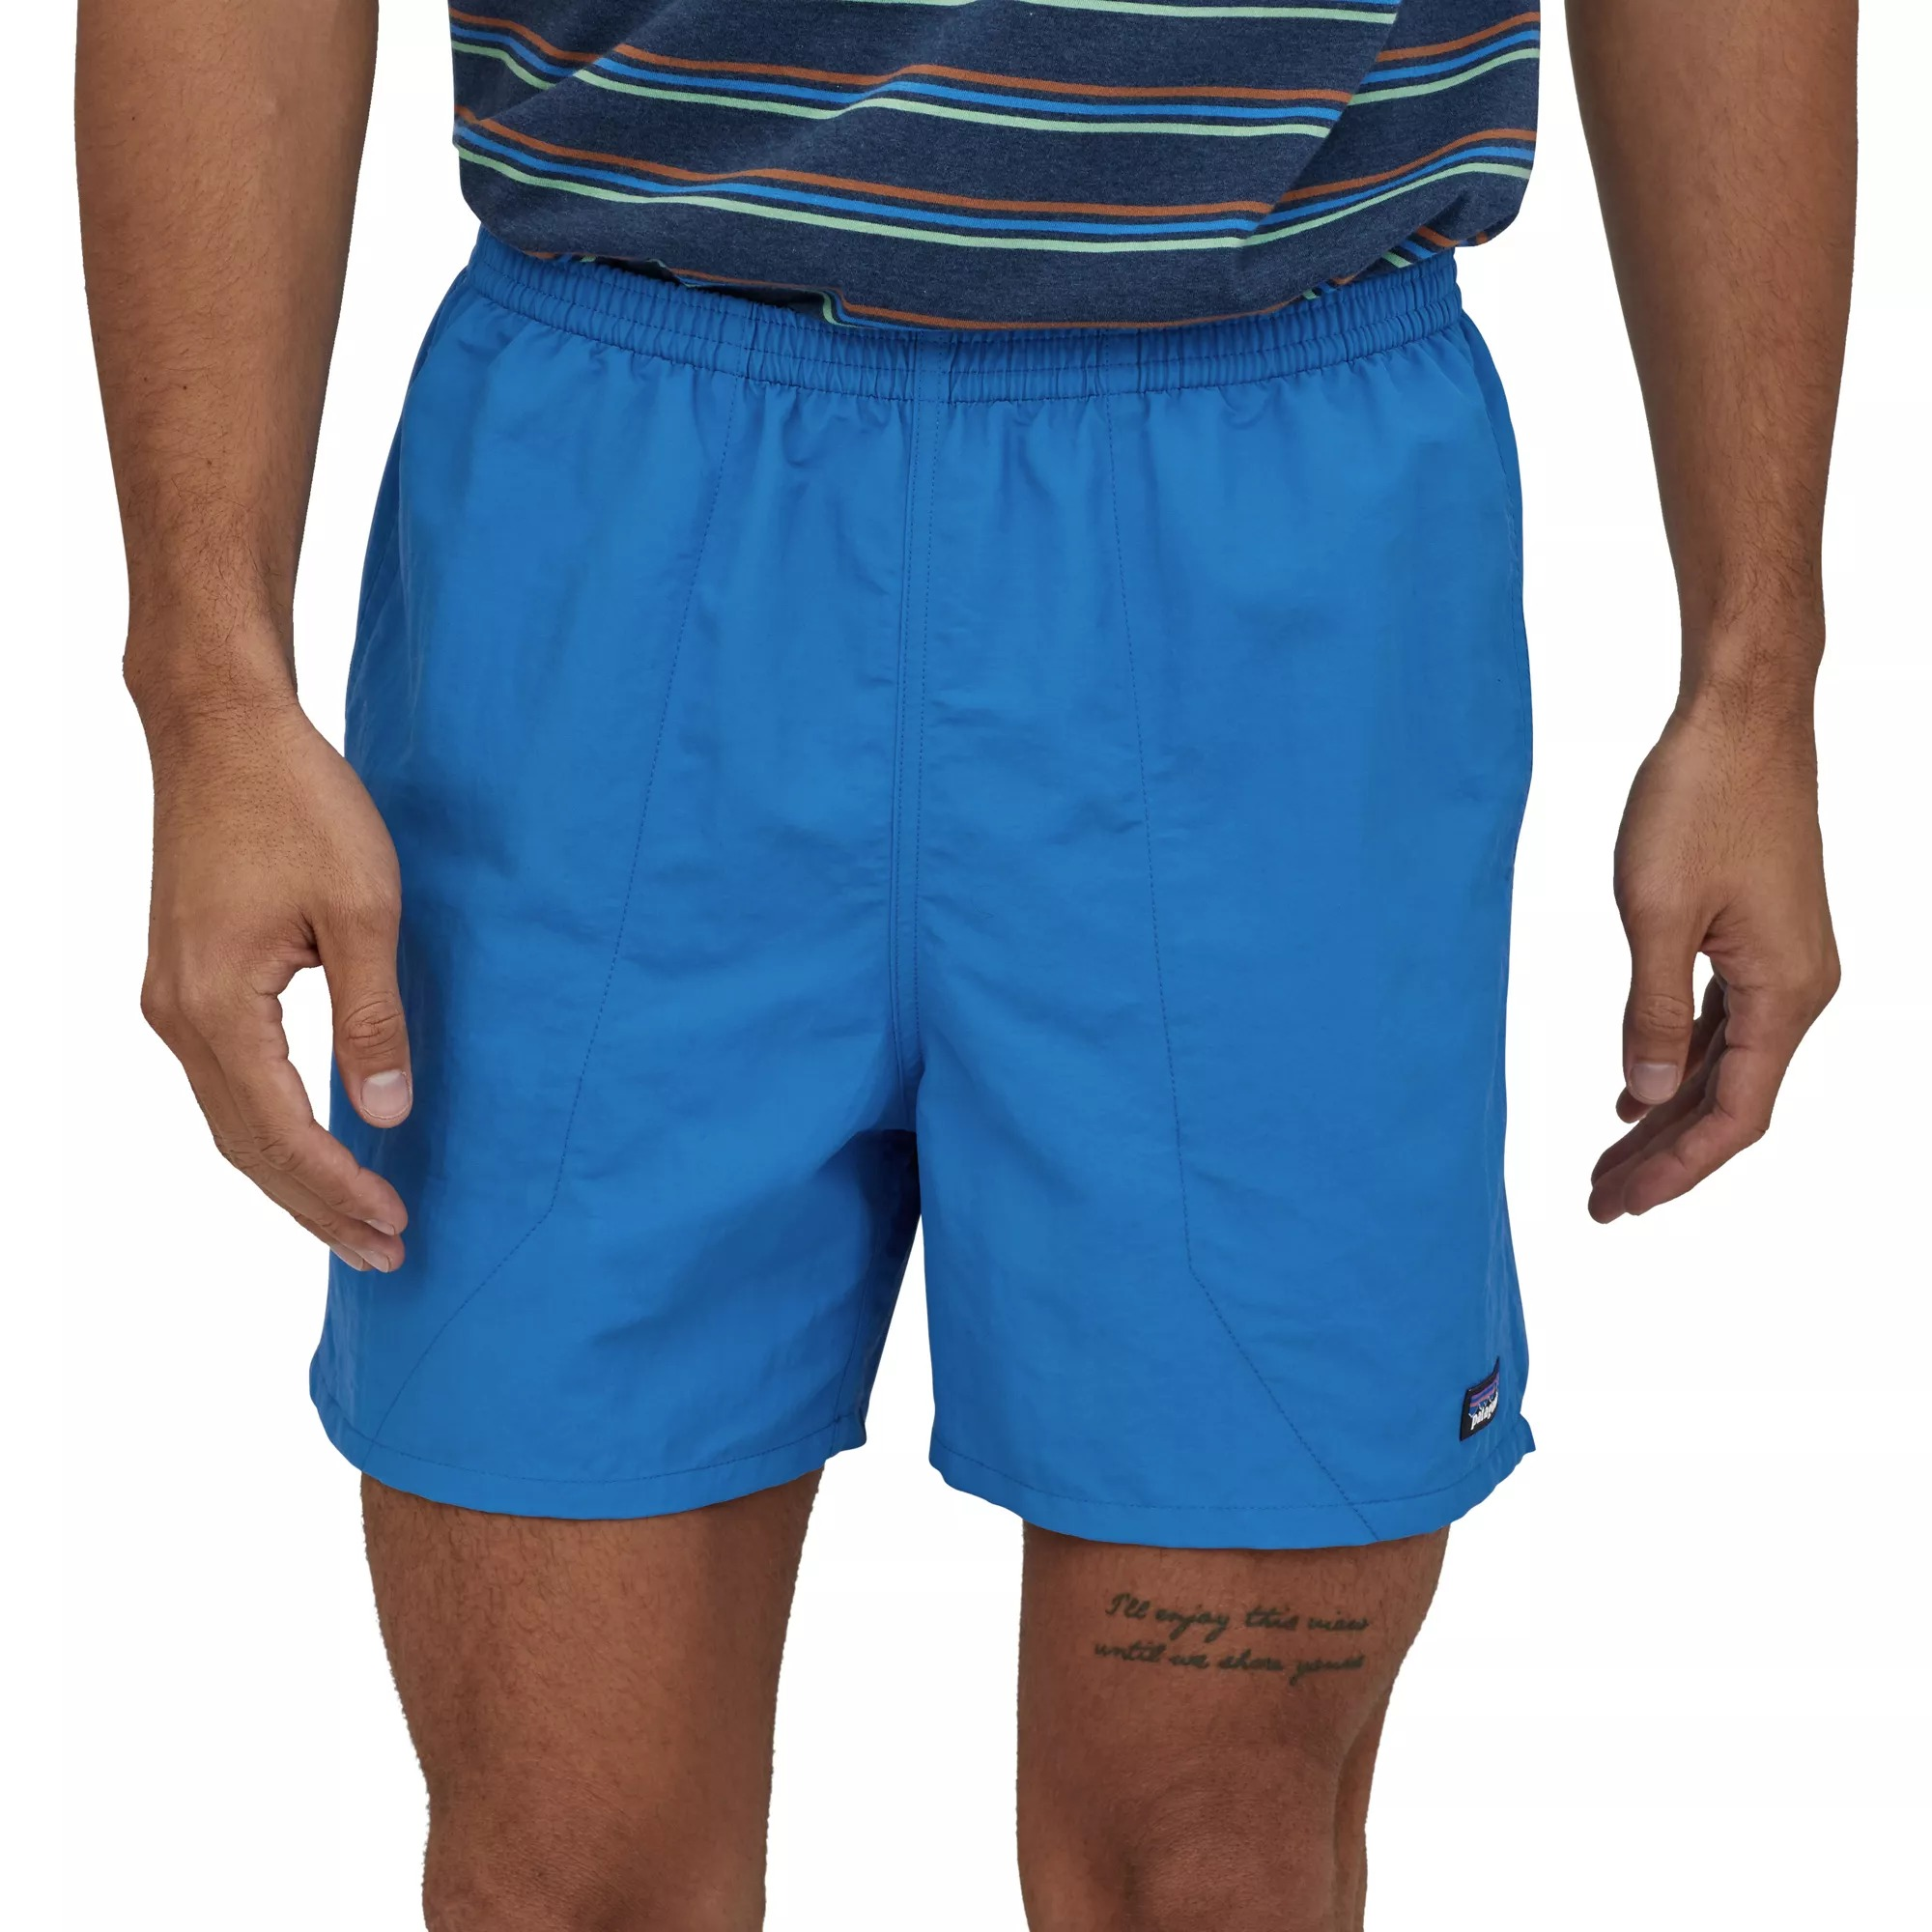 Patagonia Baggies Swim Shorts